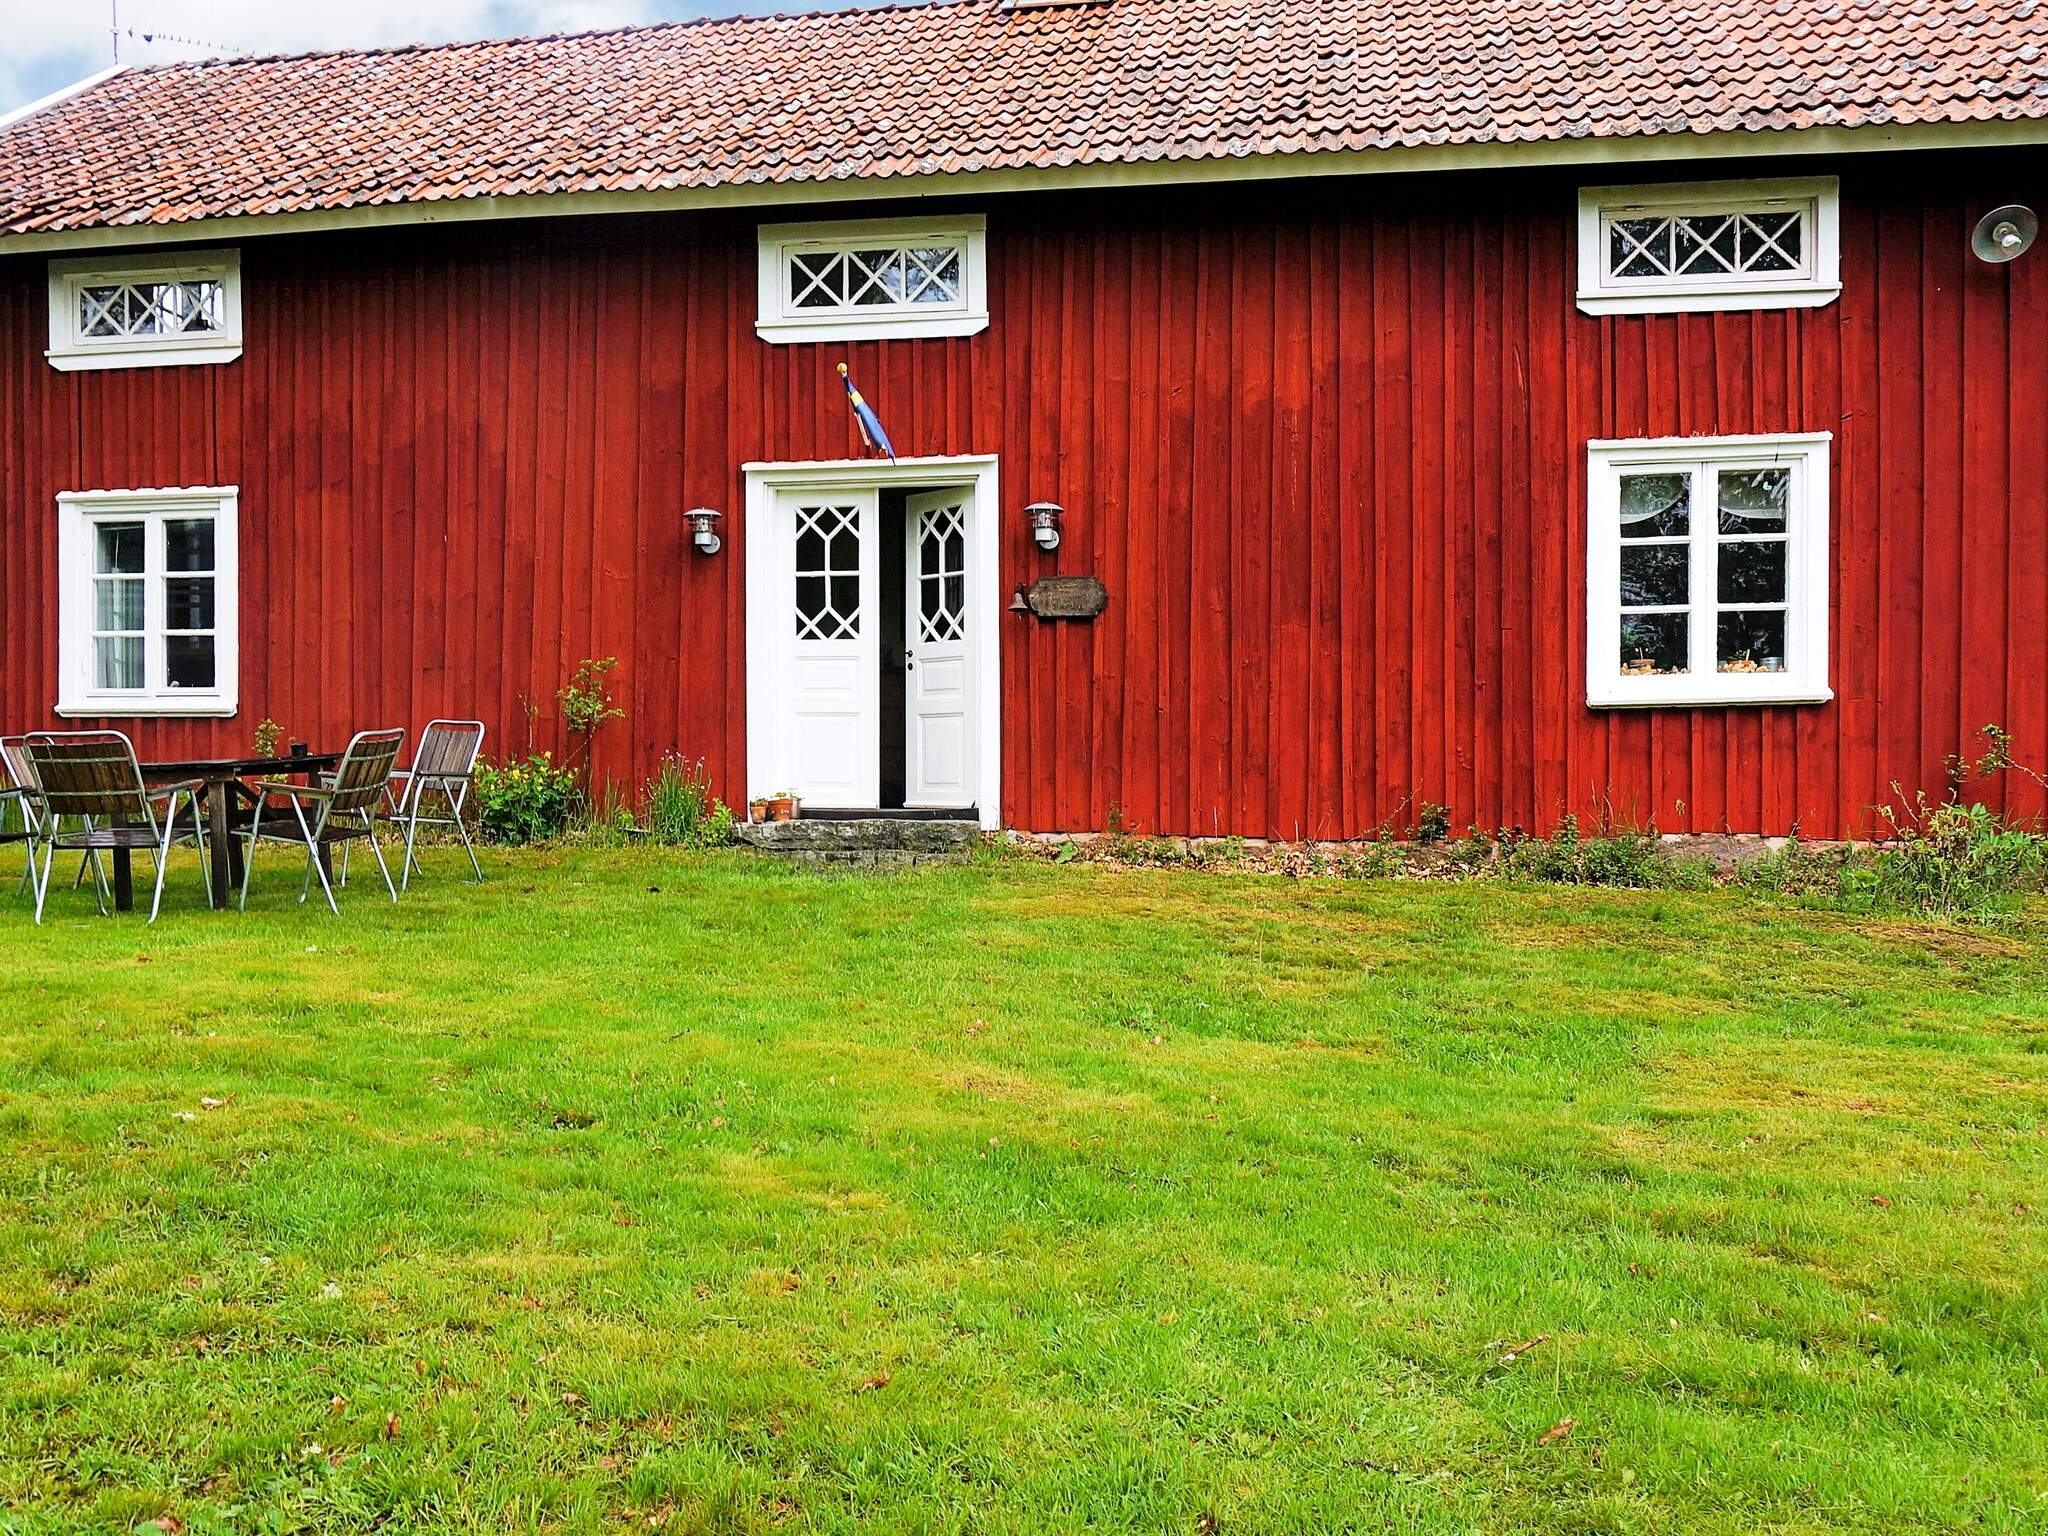 Ferienhaus Falköping (2636837), Trädet, Västra Götaland län, Westschweden, Schweden, Bild 30